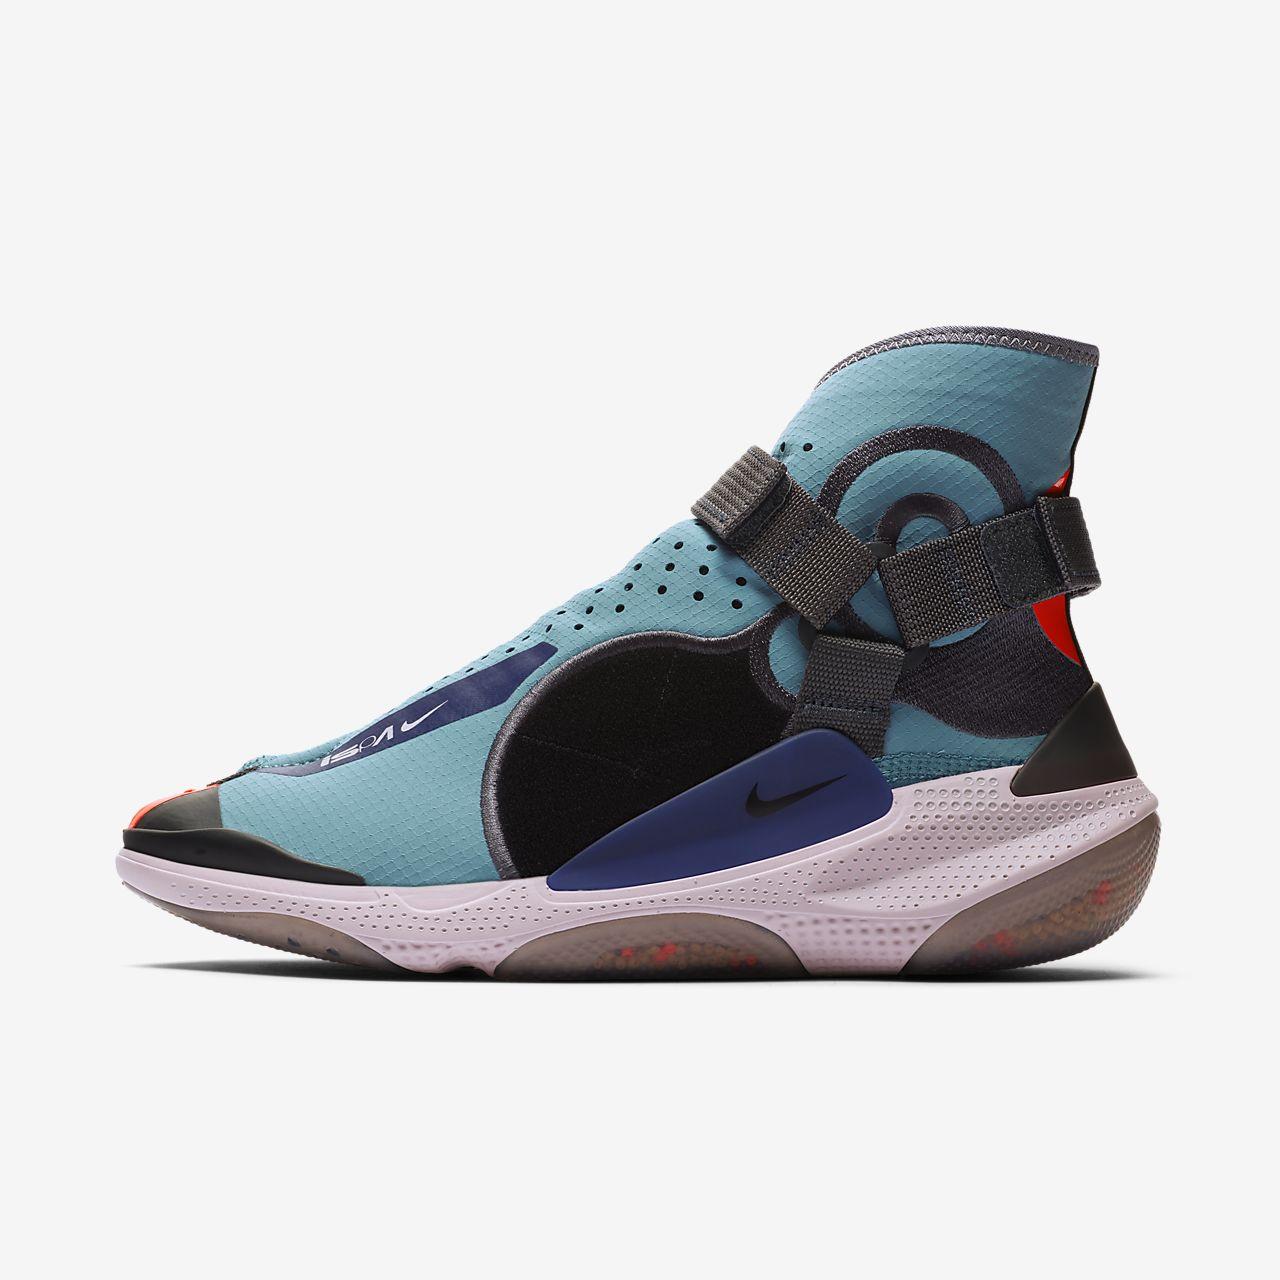 Nike ISPA Joyride Envelope Shoe